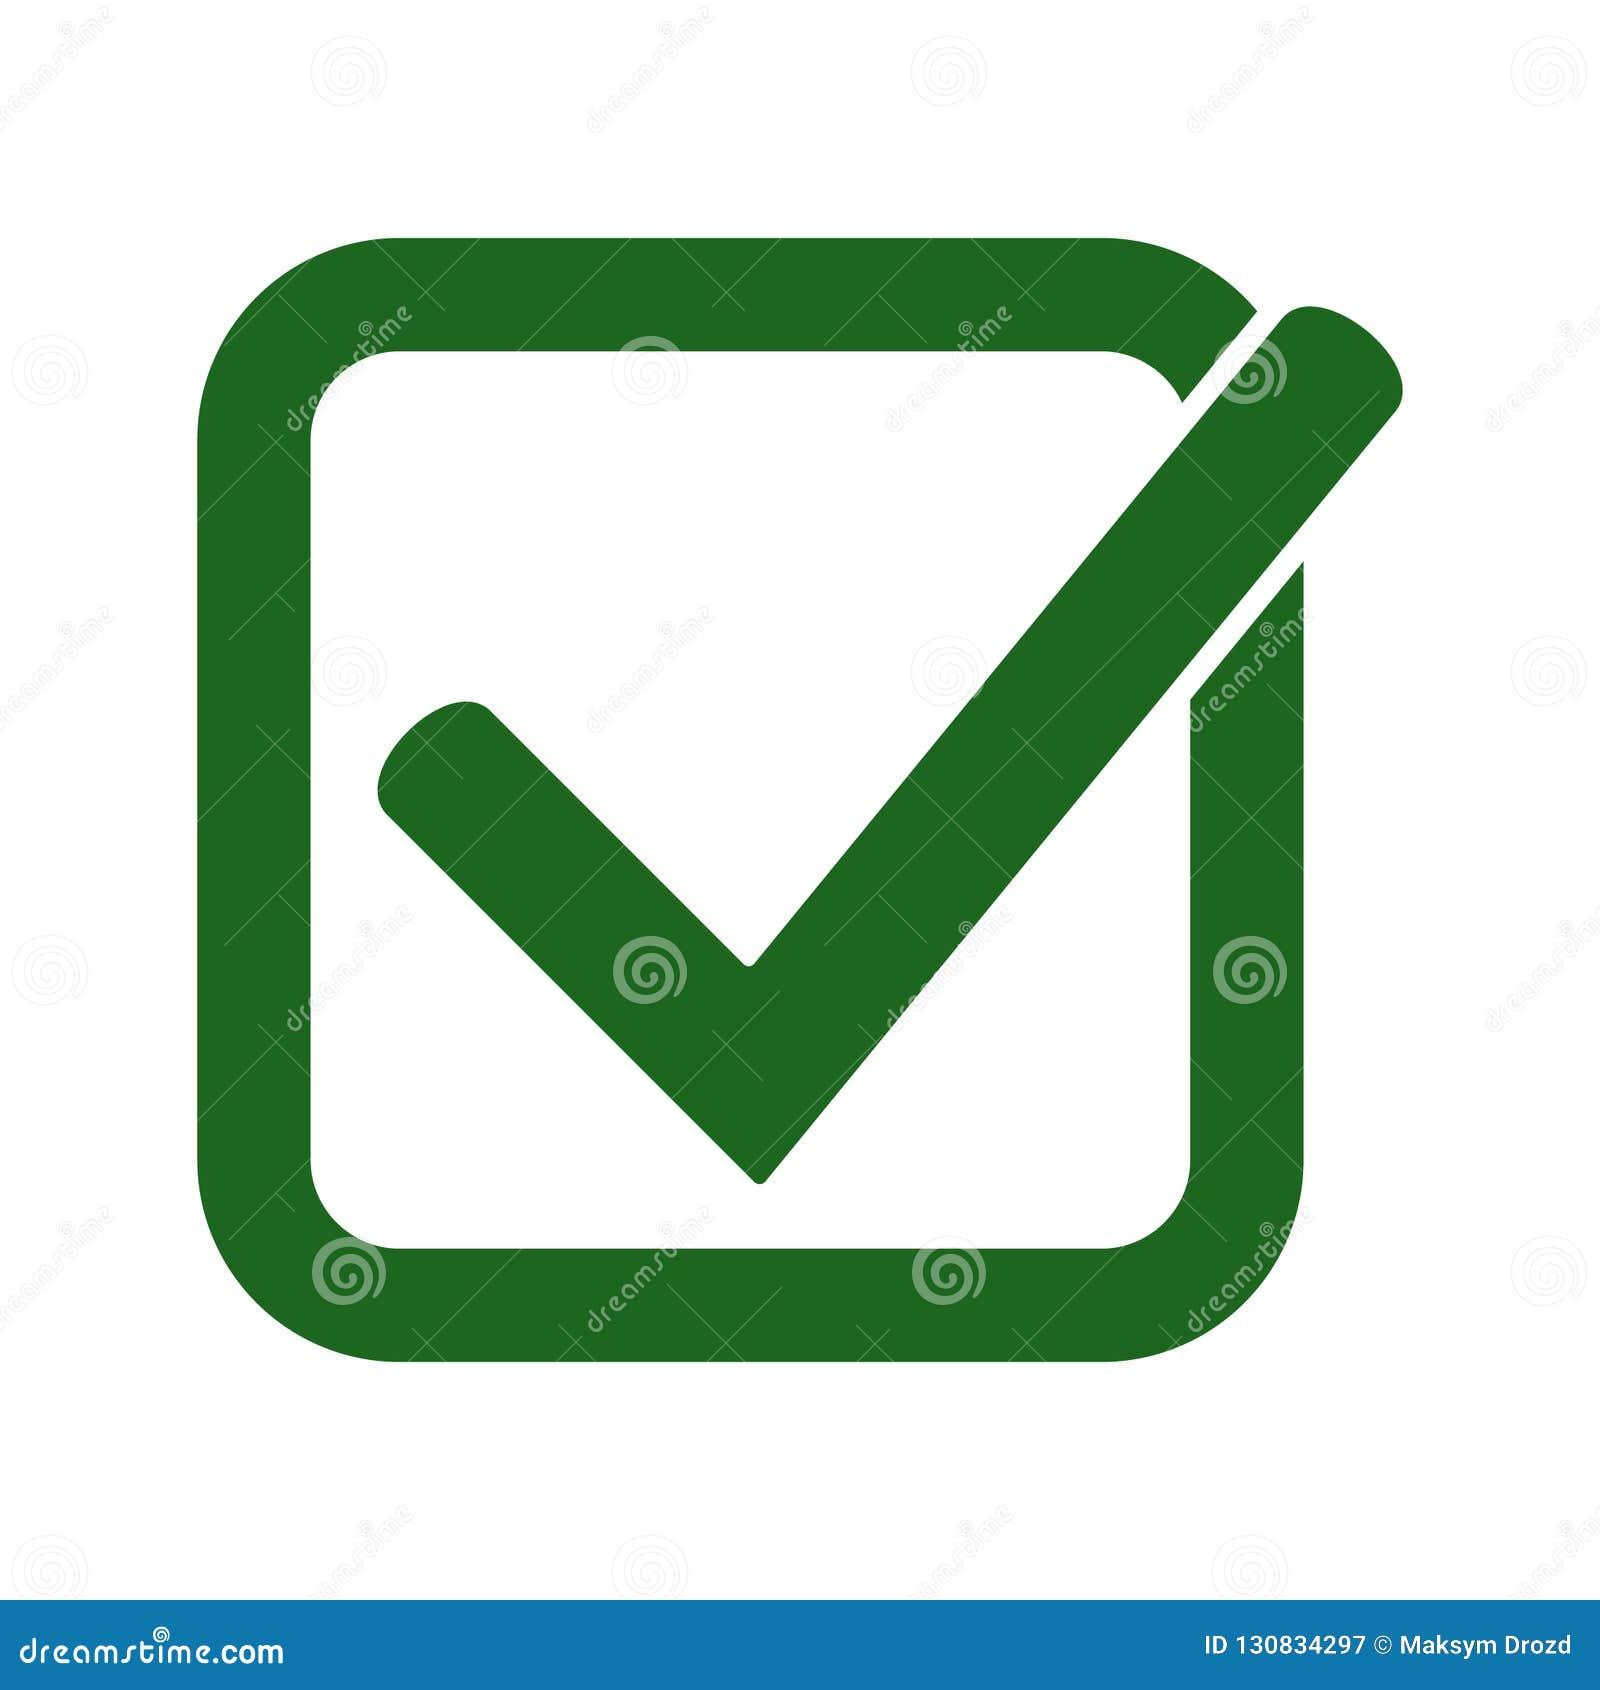 Groen vinkjepictogram Tiksymbool in groene kleur, vectorillustratie